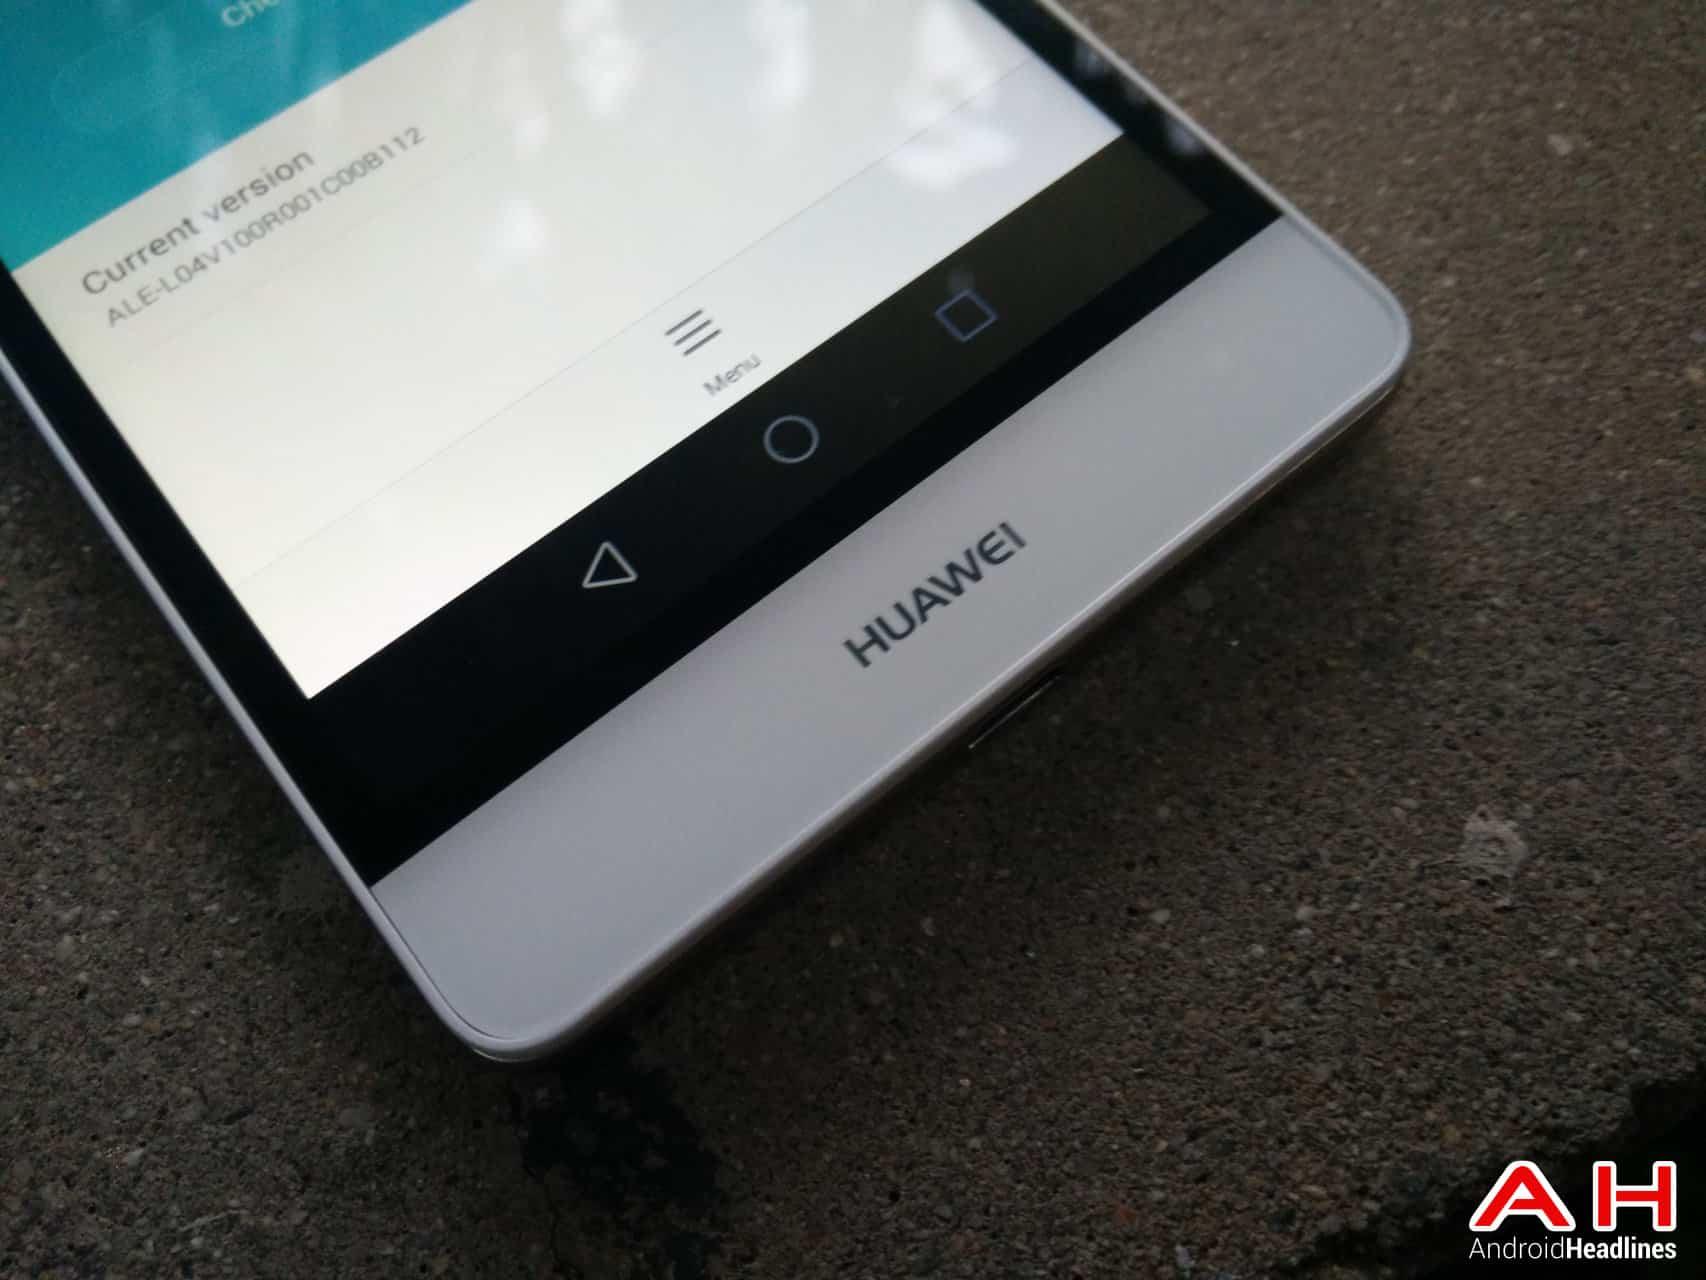 Huawei P8 Lite AH 01-42